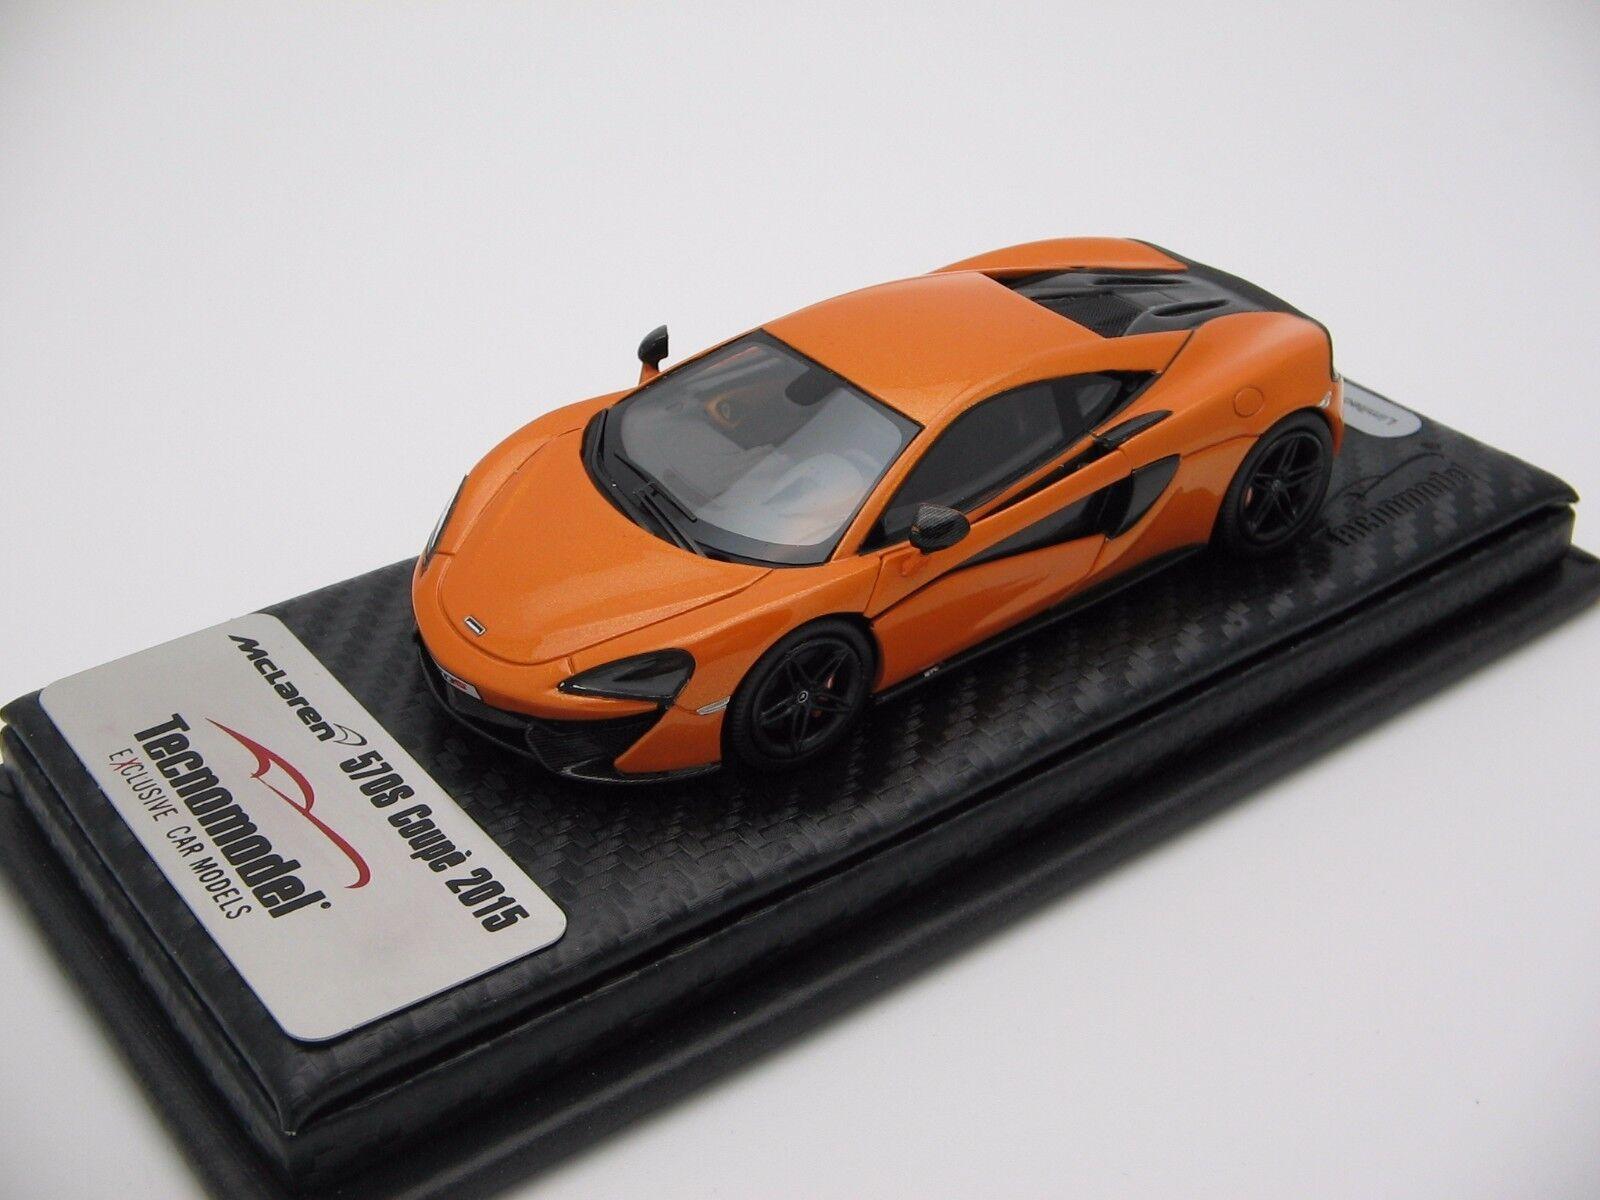 1 43 Scale Tecnomodel McLaren 570s Tarocco orange N.Y AUTOSHOW 2016 t43-ex02a